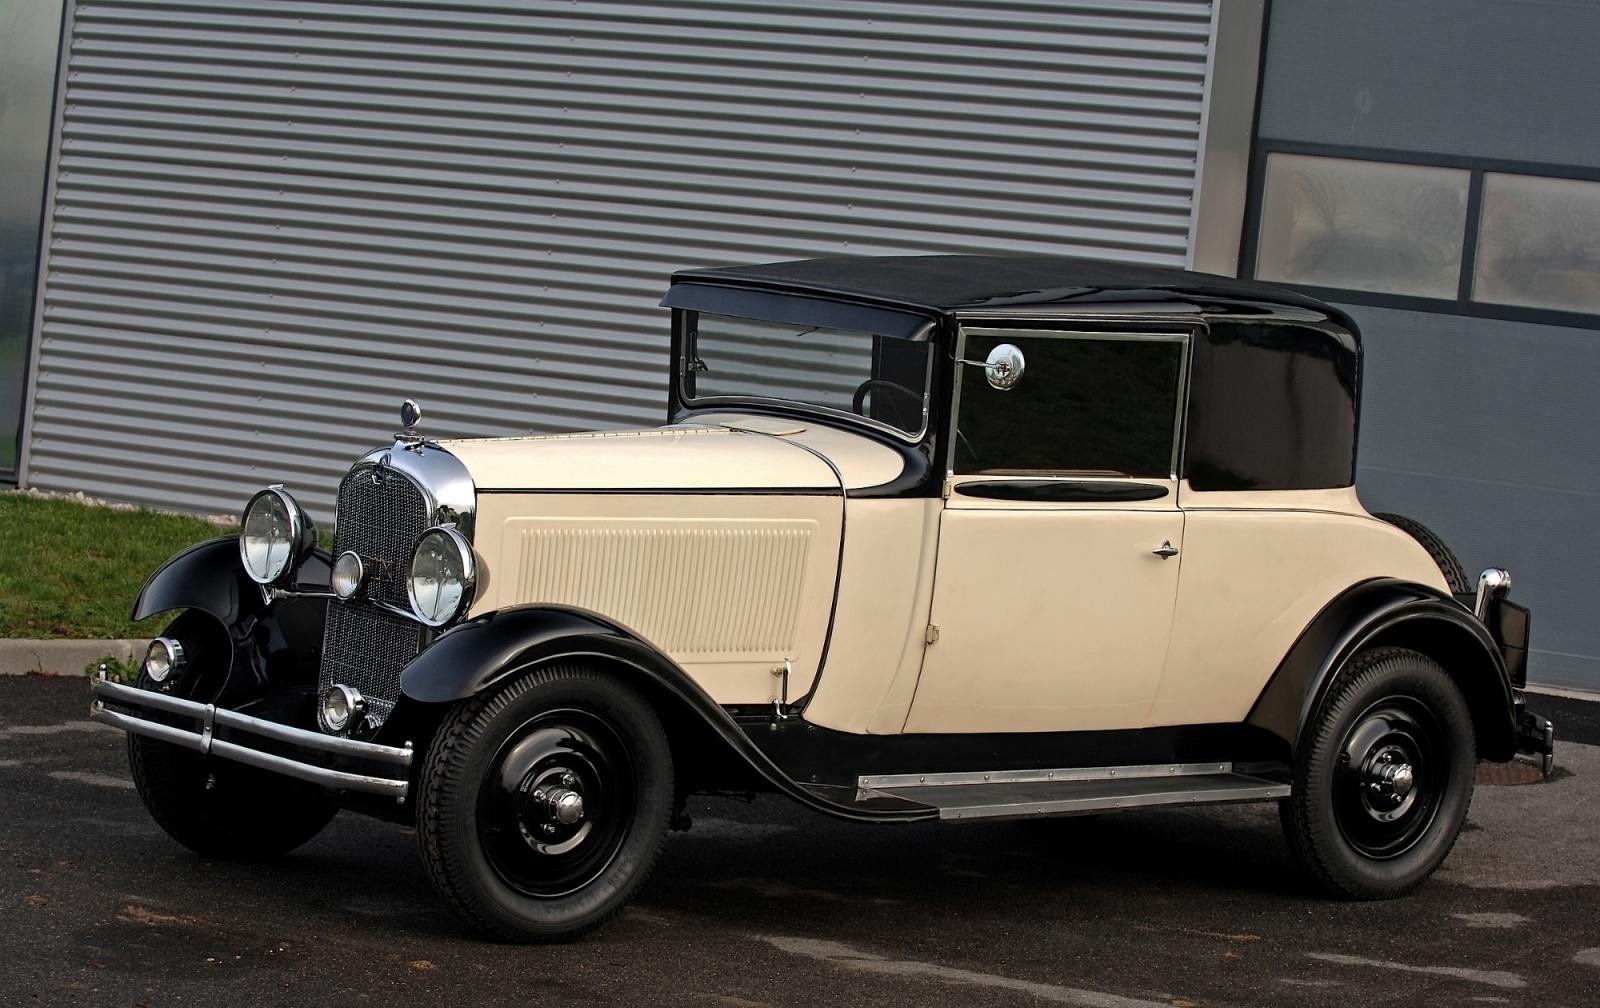 C6 του 1929, πρώτο μοντέλο με αυτό το όνομα